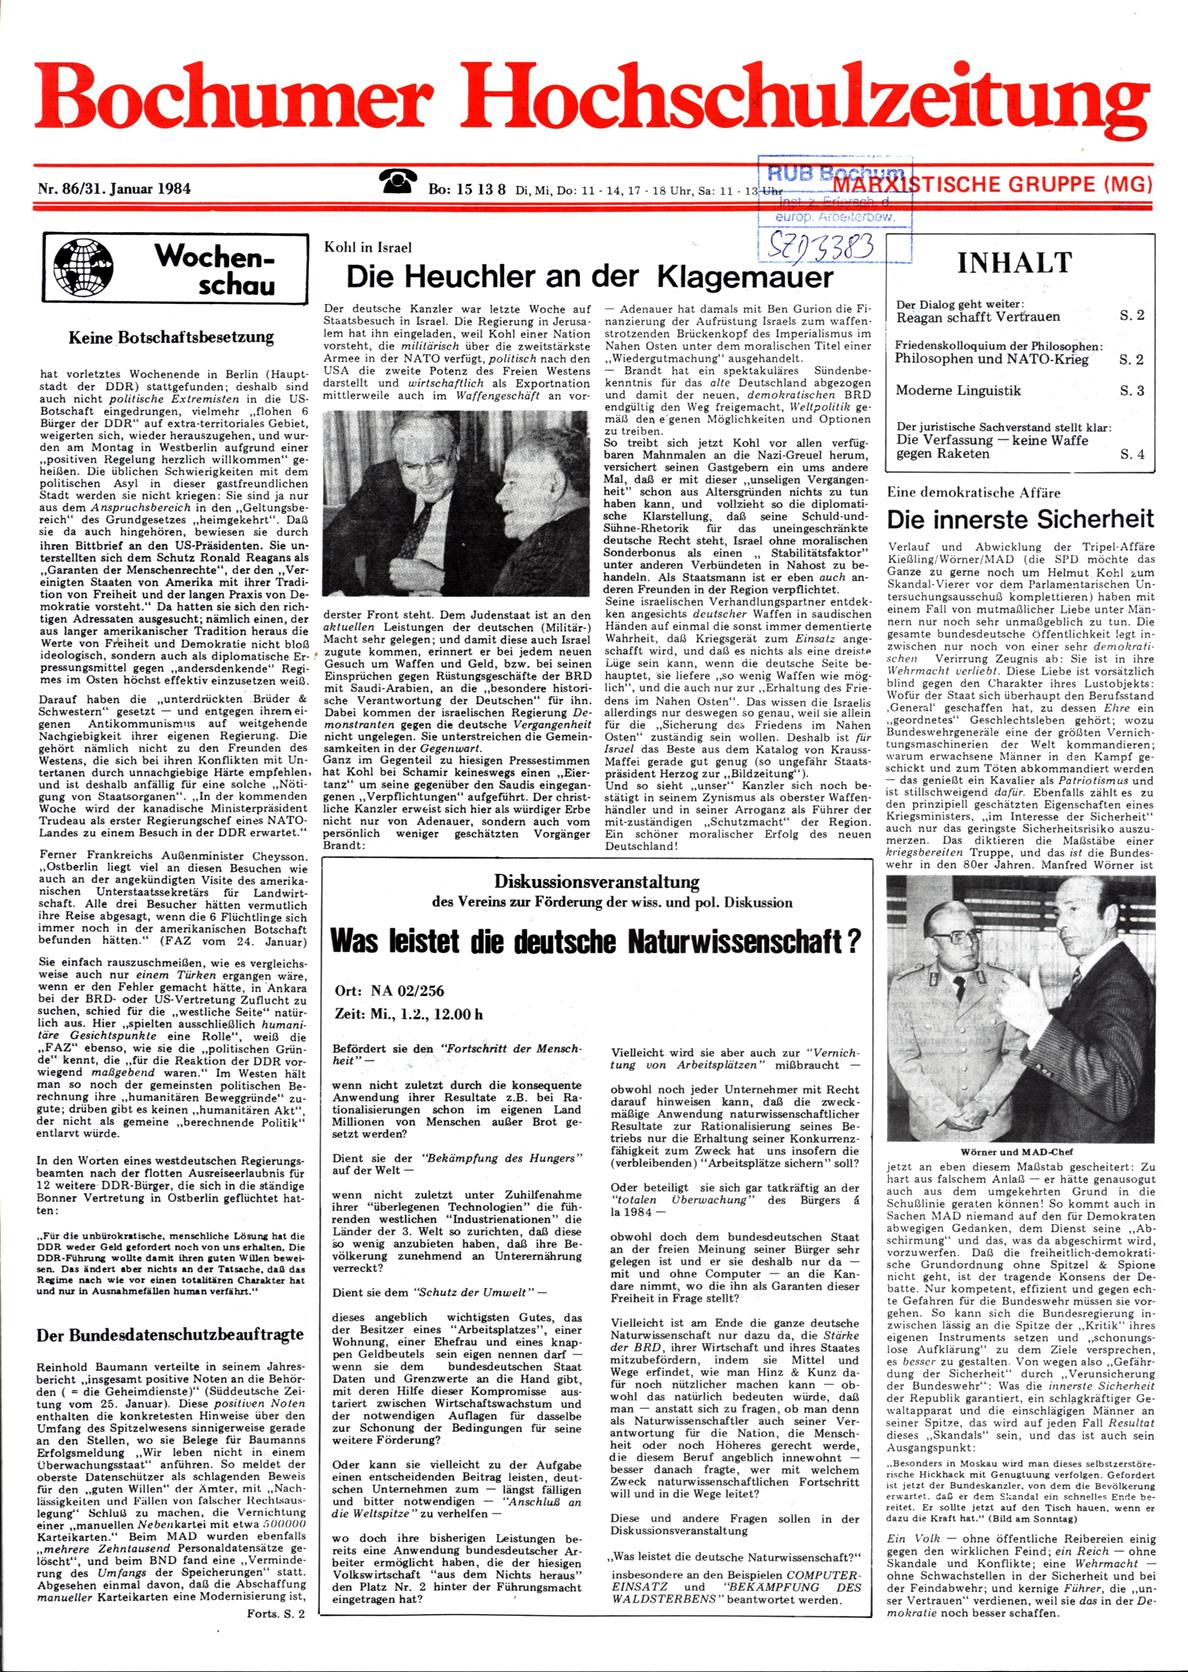 Bochum_BHZ_19840131_086_001